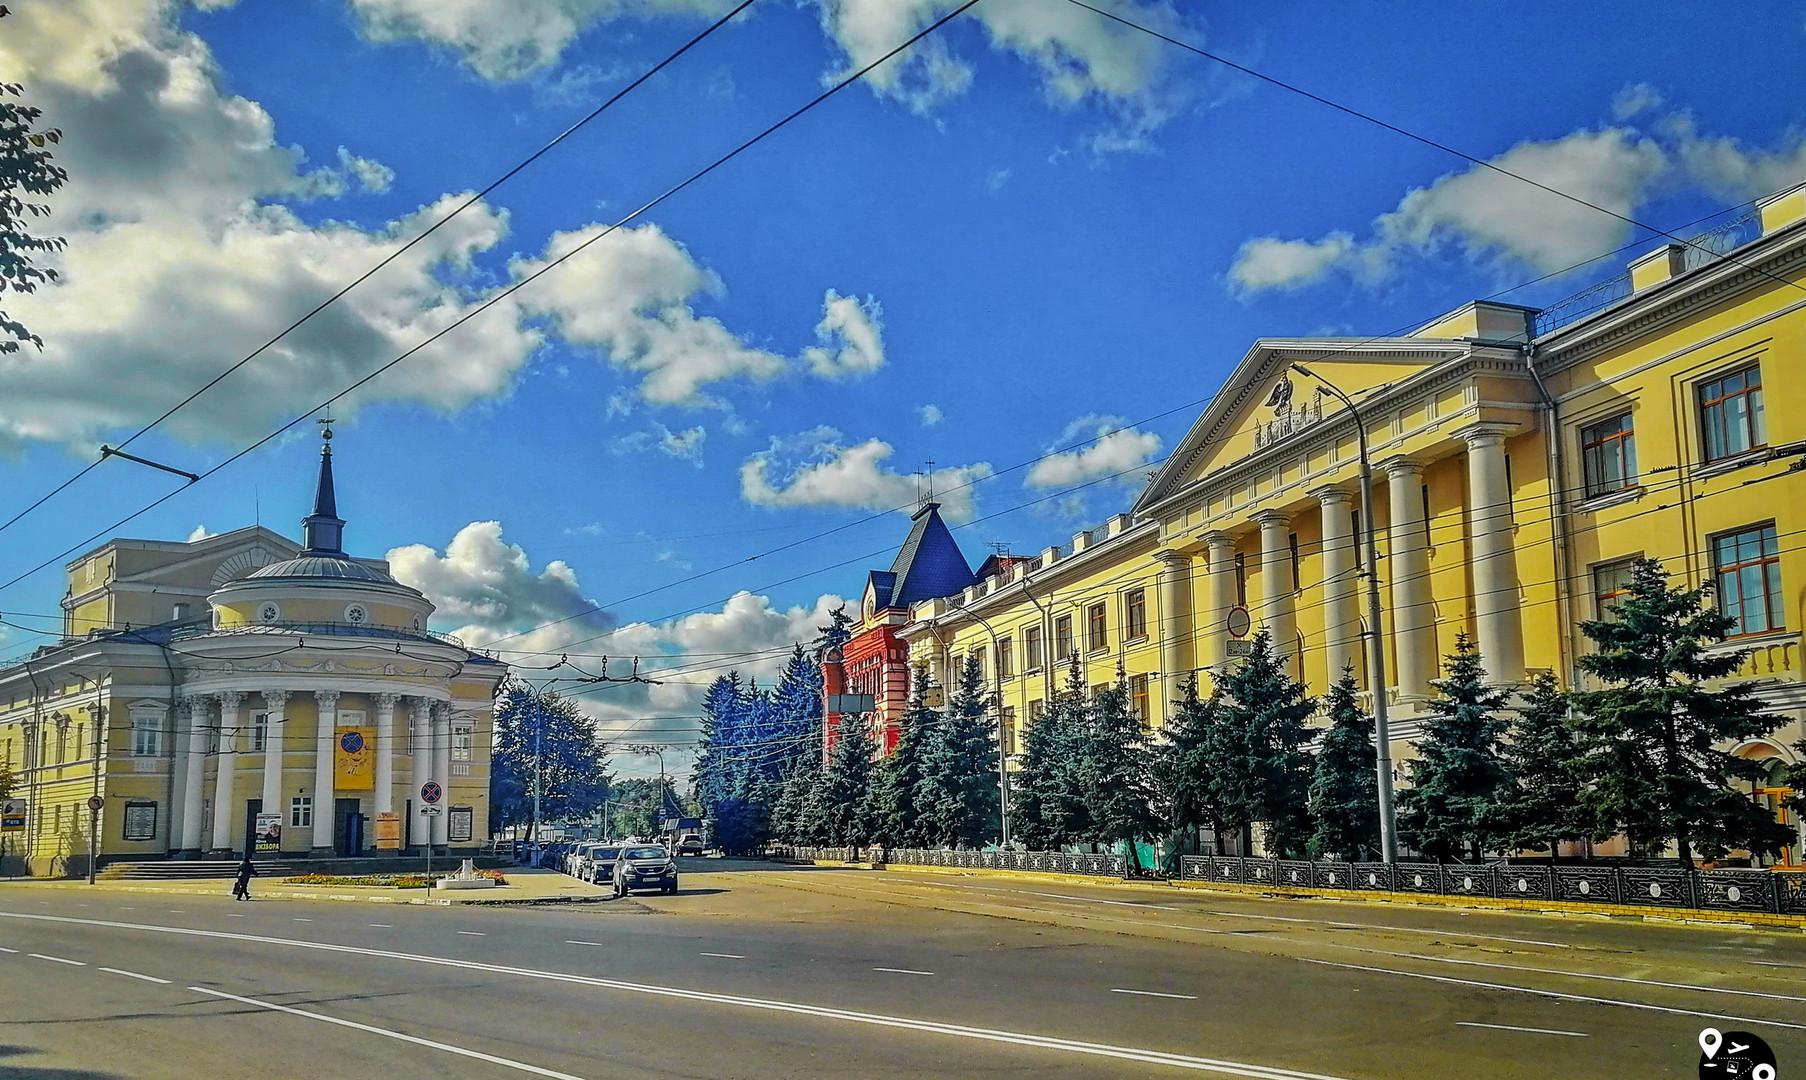 Площадь Карла Маркса, Орел